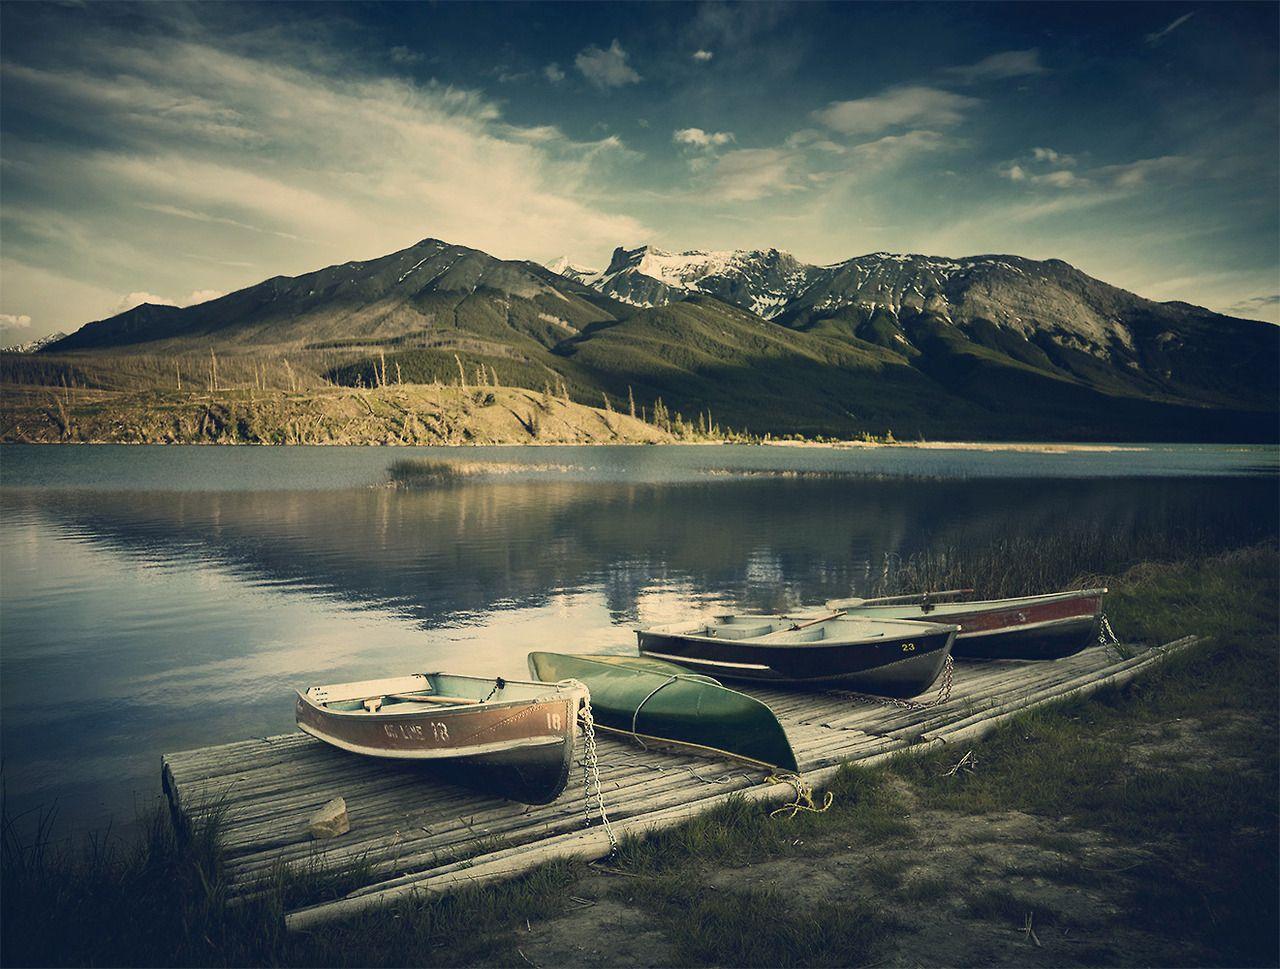 #wanderlust #lake #JasperNationalPark #canoe #mountain #Canada